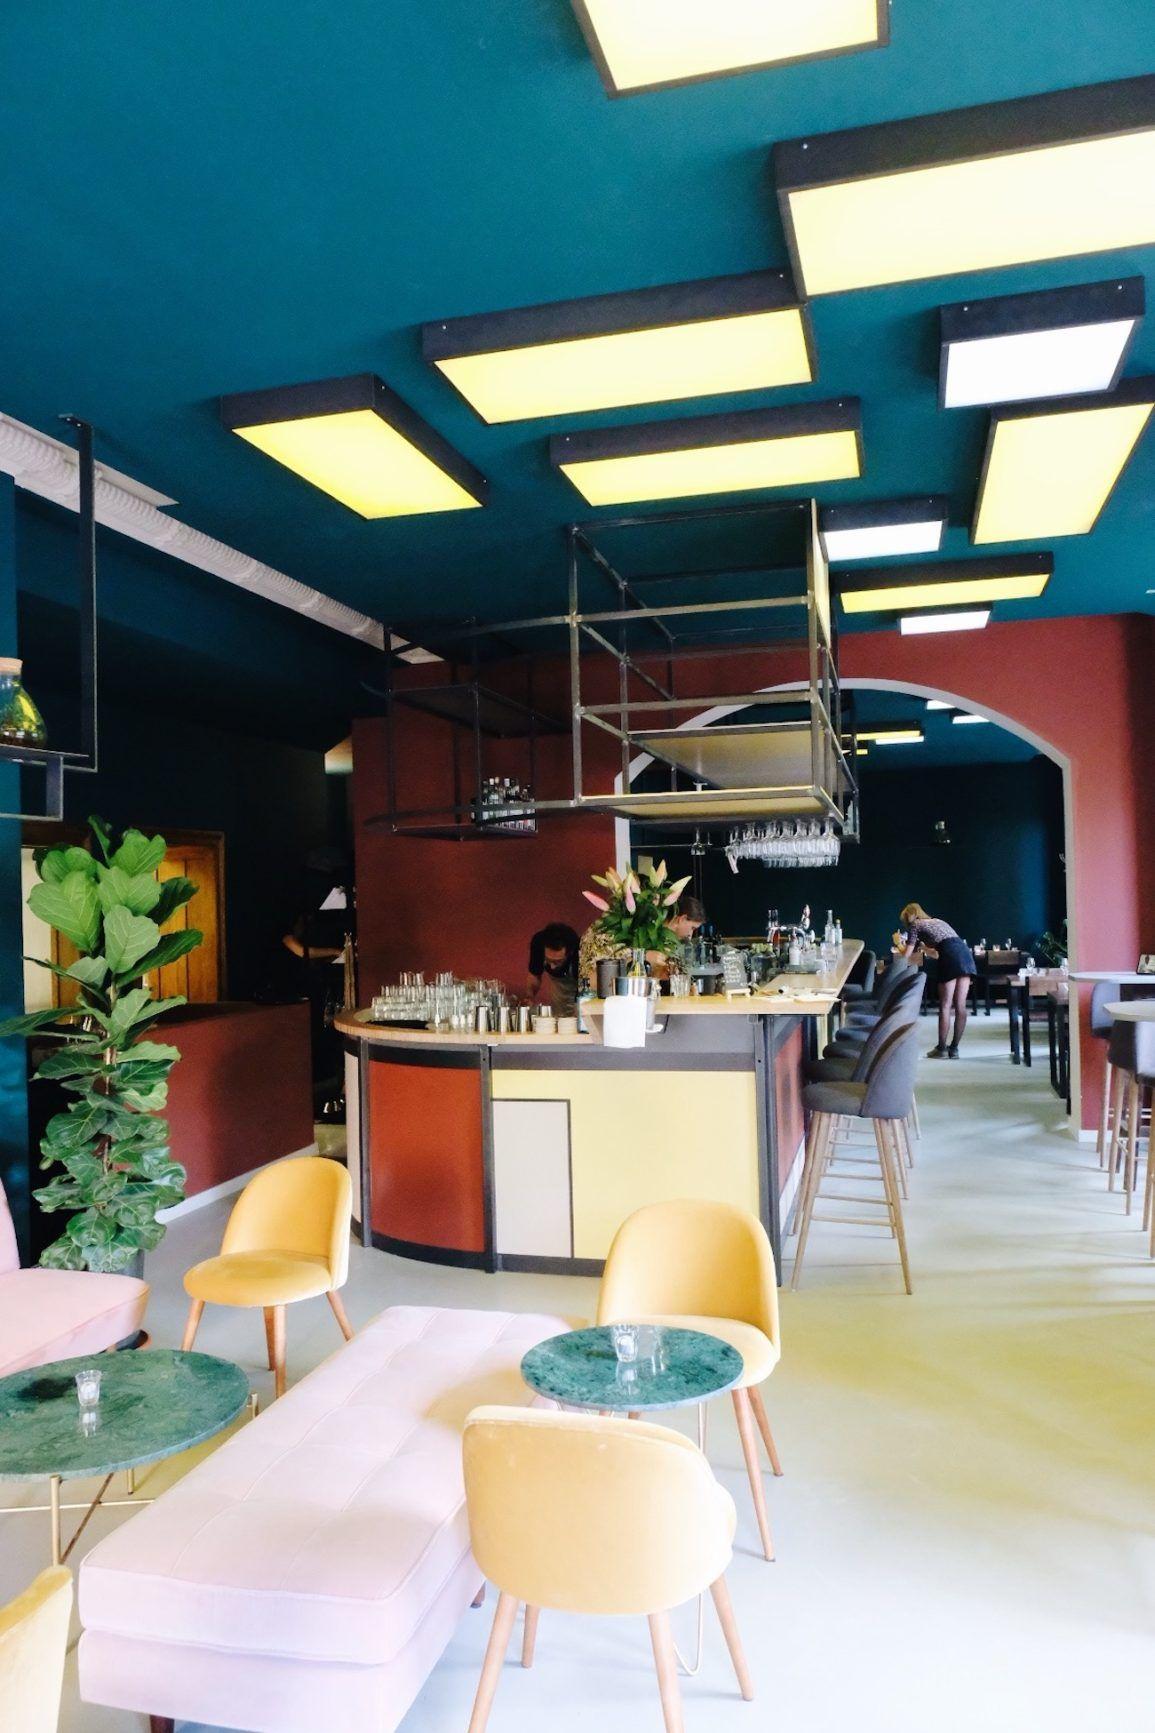 About Fuel, Foodblog, Leckerbissen, Bonvivant, Cocktail-Bistro, Bar, Interior